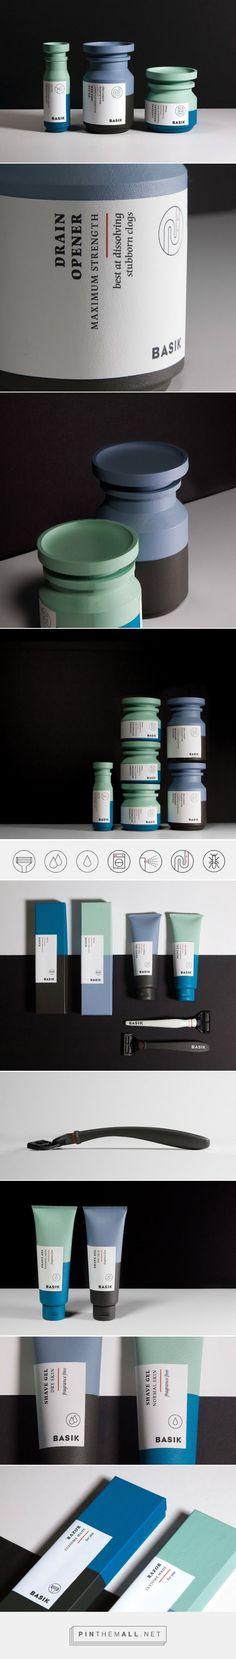 Basik #packaging by Saana Hellsten - http://www.packagingoftheworld.com/2014/12/basik.html